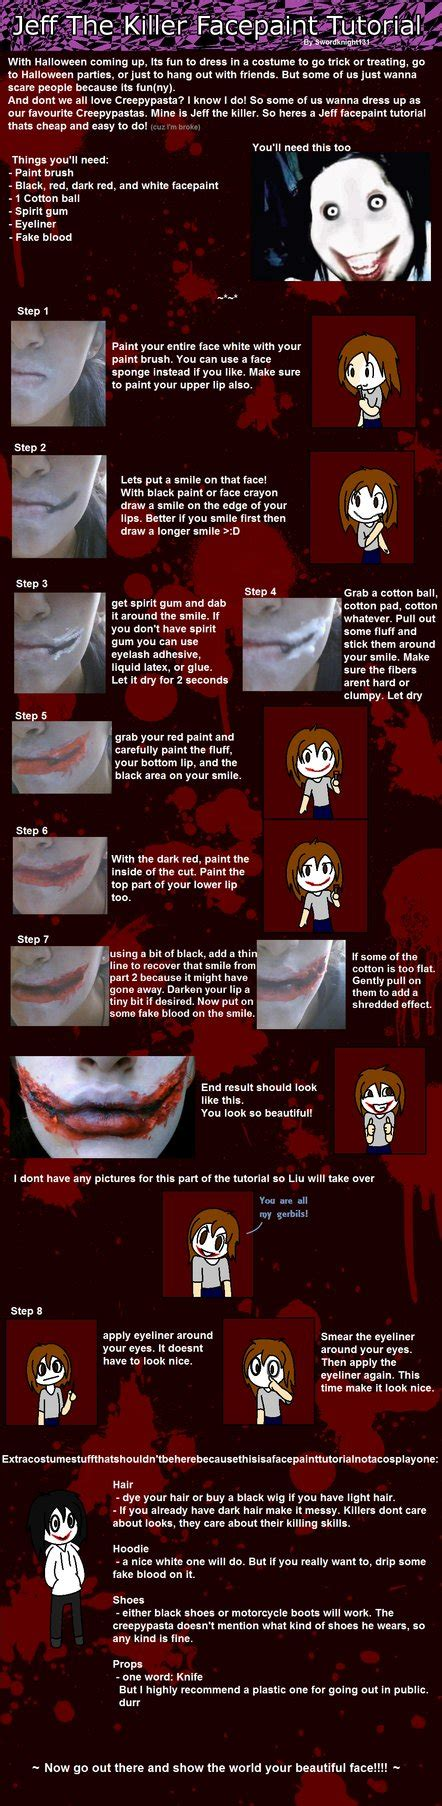 makeup tutorial jeff the killer epic jeff the killer facepaint tutorial by swordknight131